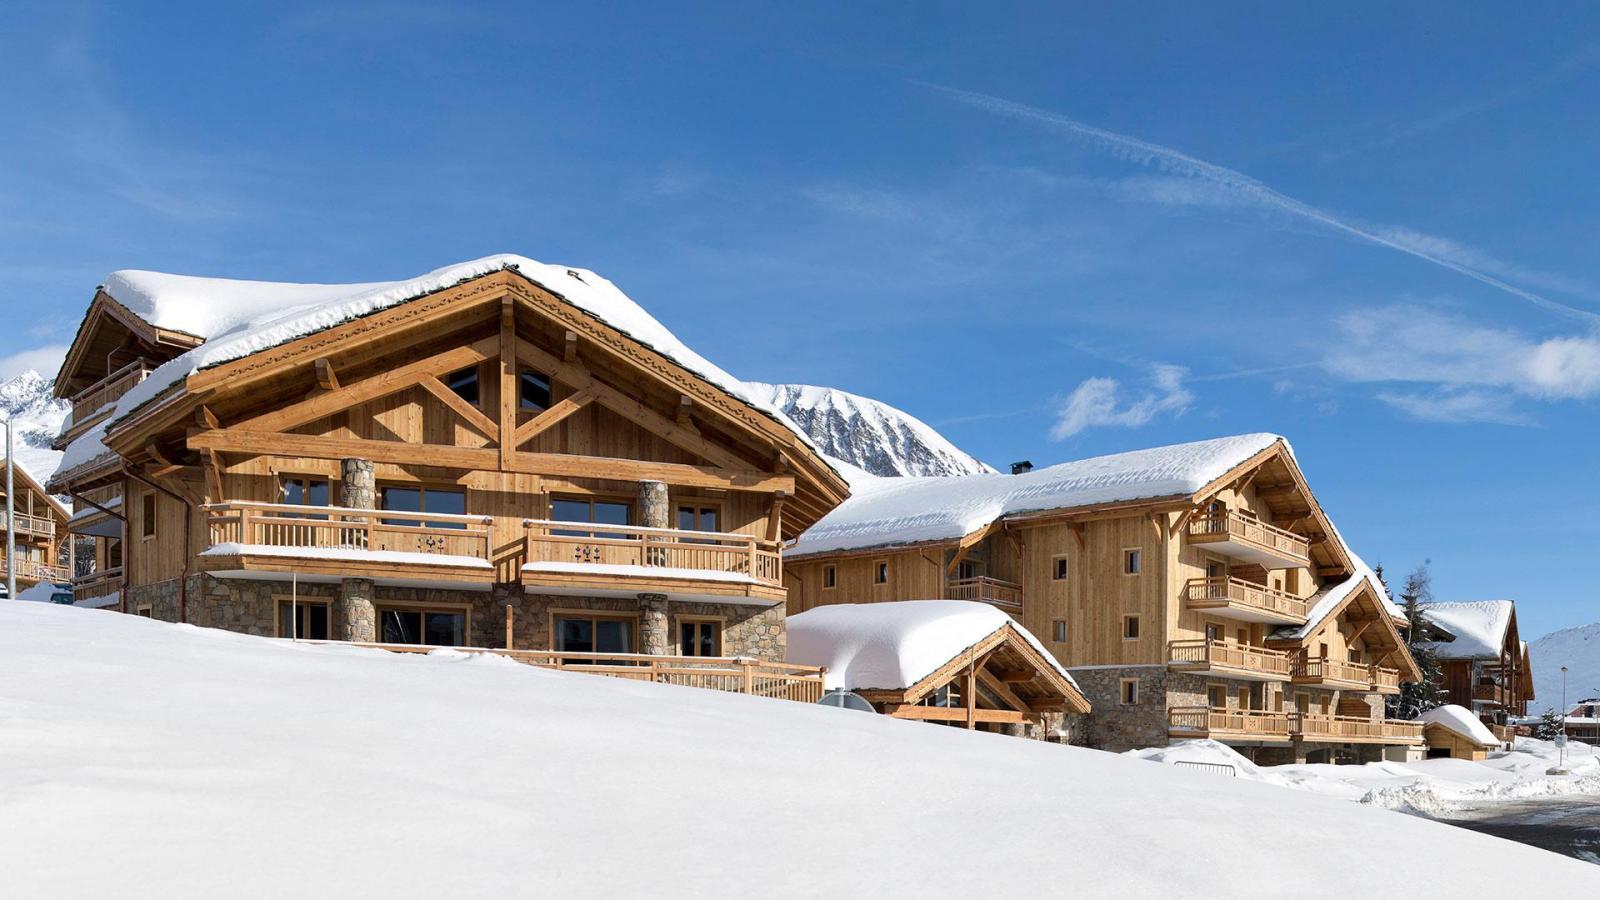 r sidence le cristal de l 39 alpe 15 alpe d 39 huez location vacances ski alpe d 39 huez ski planet. Black Bedroom Furniture Sets. Home Design Ideas